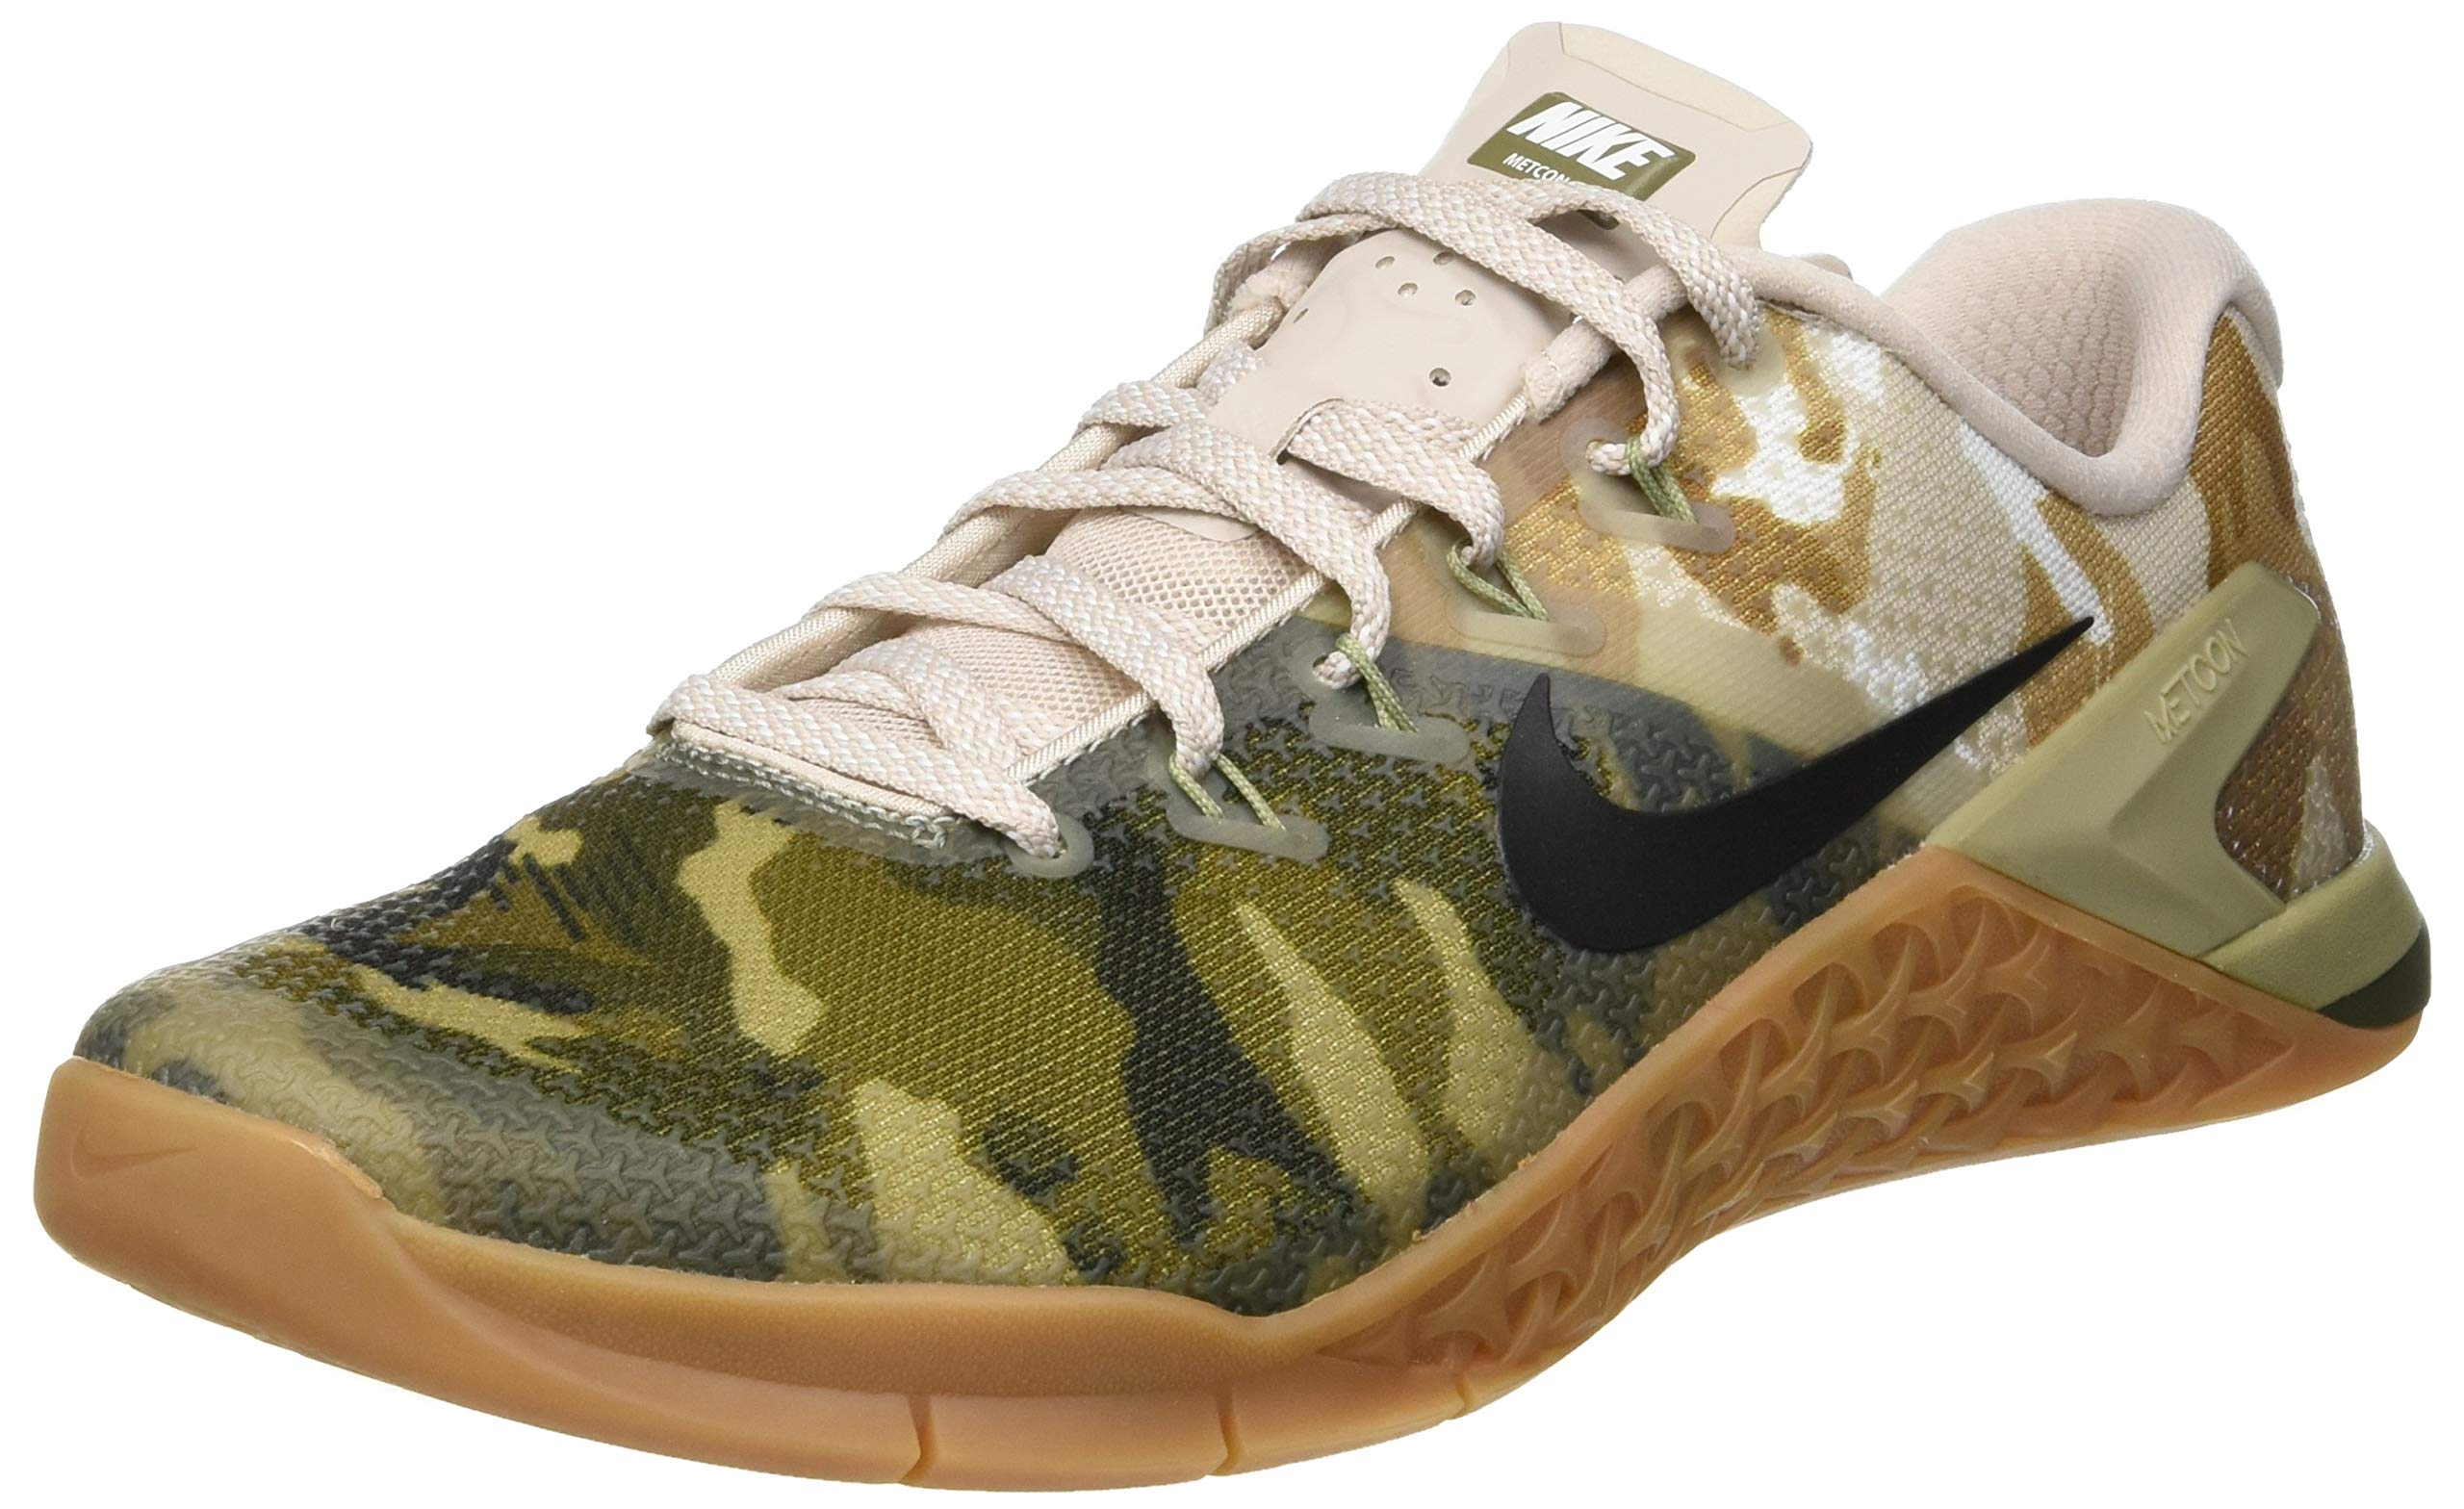 Nike Metcon 4 AH7453-300 Camo Olive Canvas/Gum Brown/White Men's Training Shoes (7.5 D US)